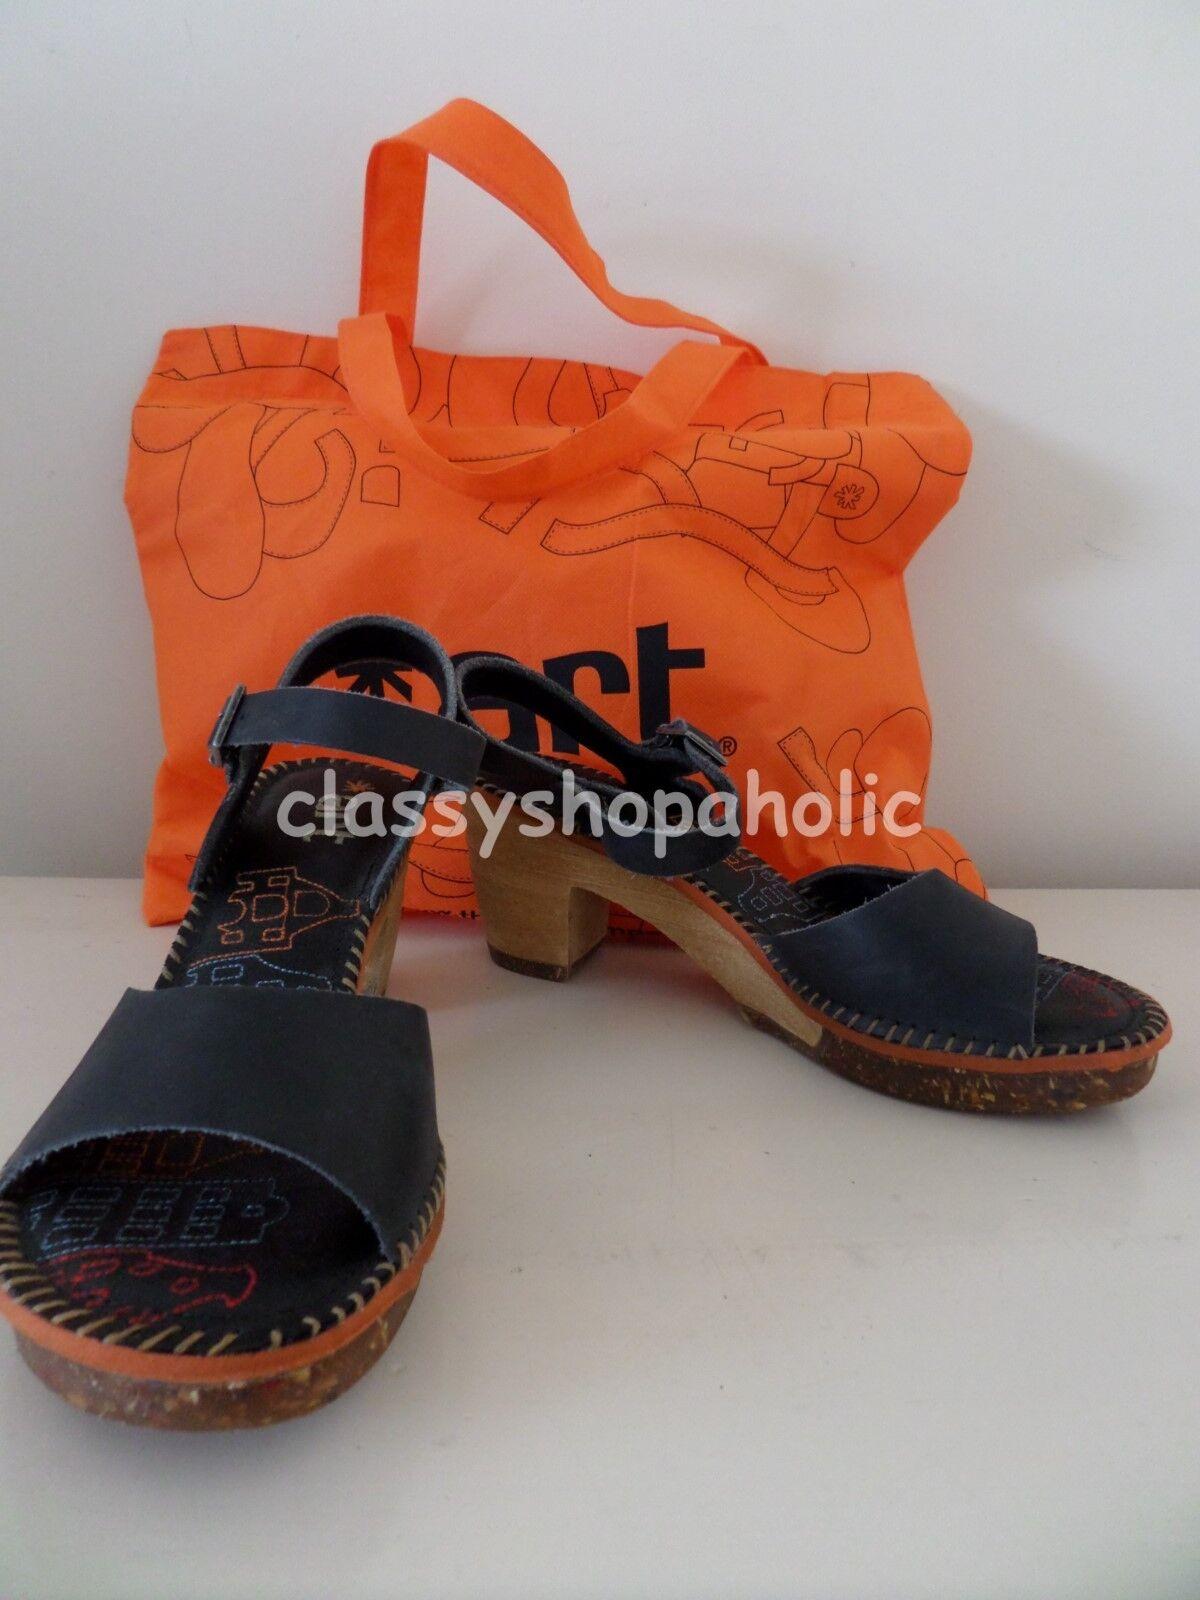 Art Black Leather Amsterdam Sandals - Size 38 UK 5 - BNIB